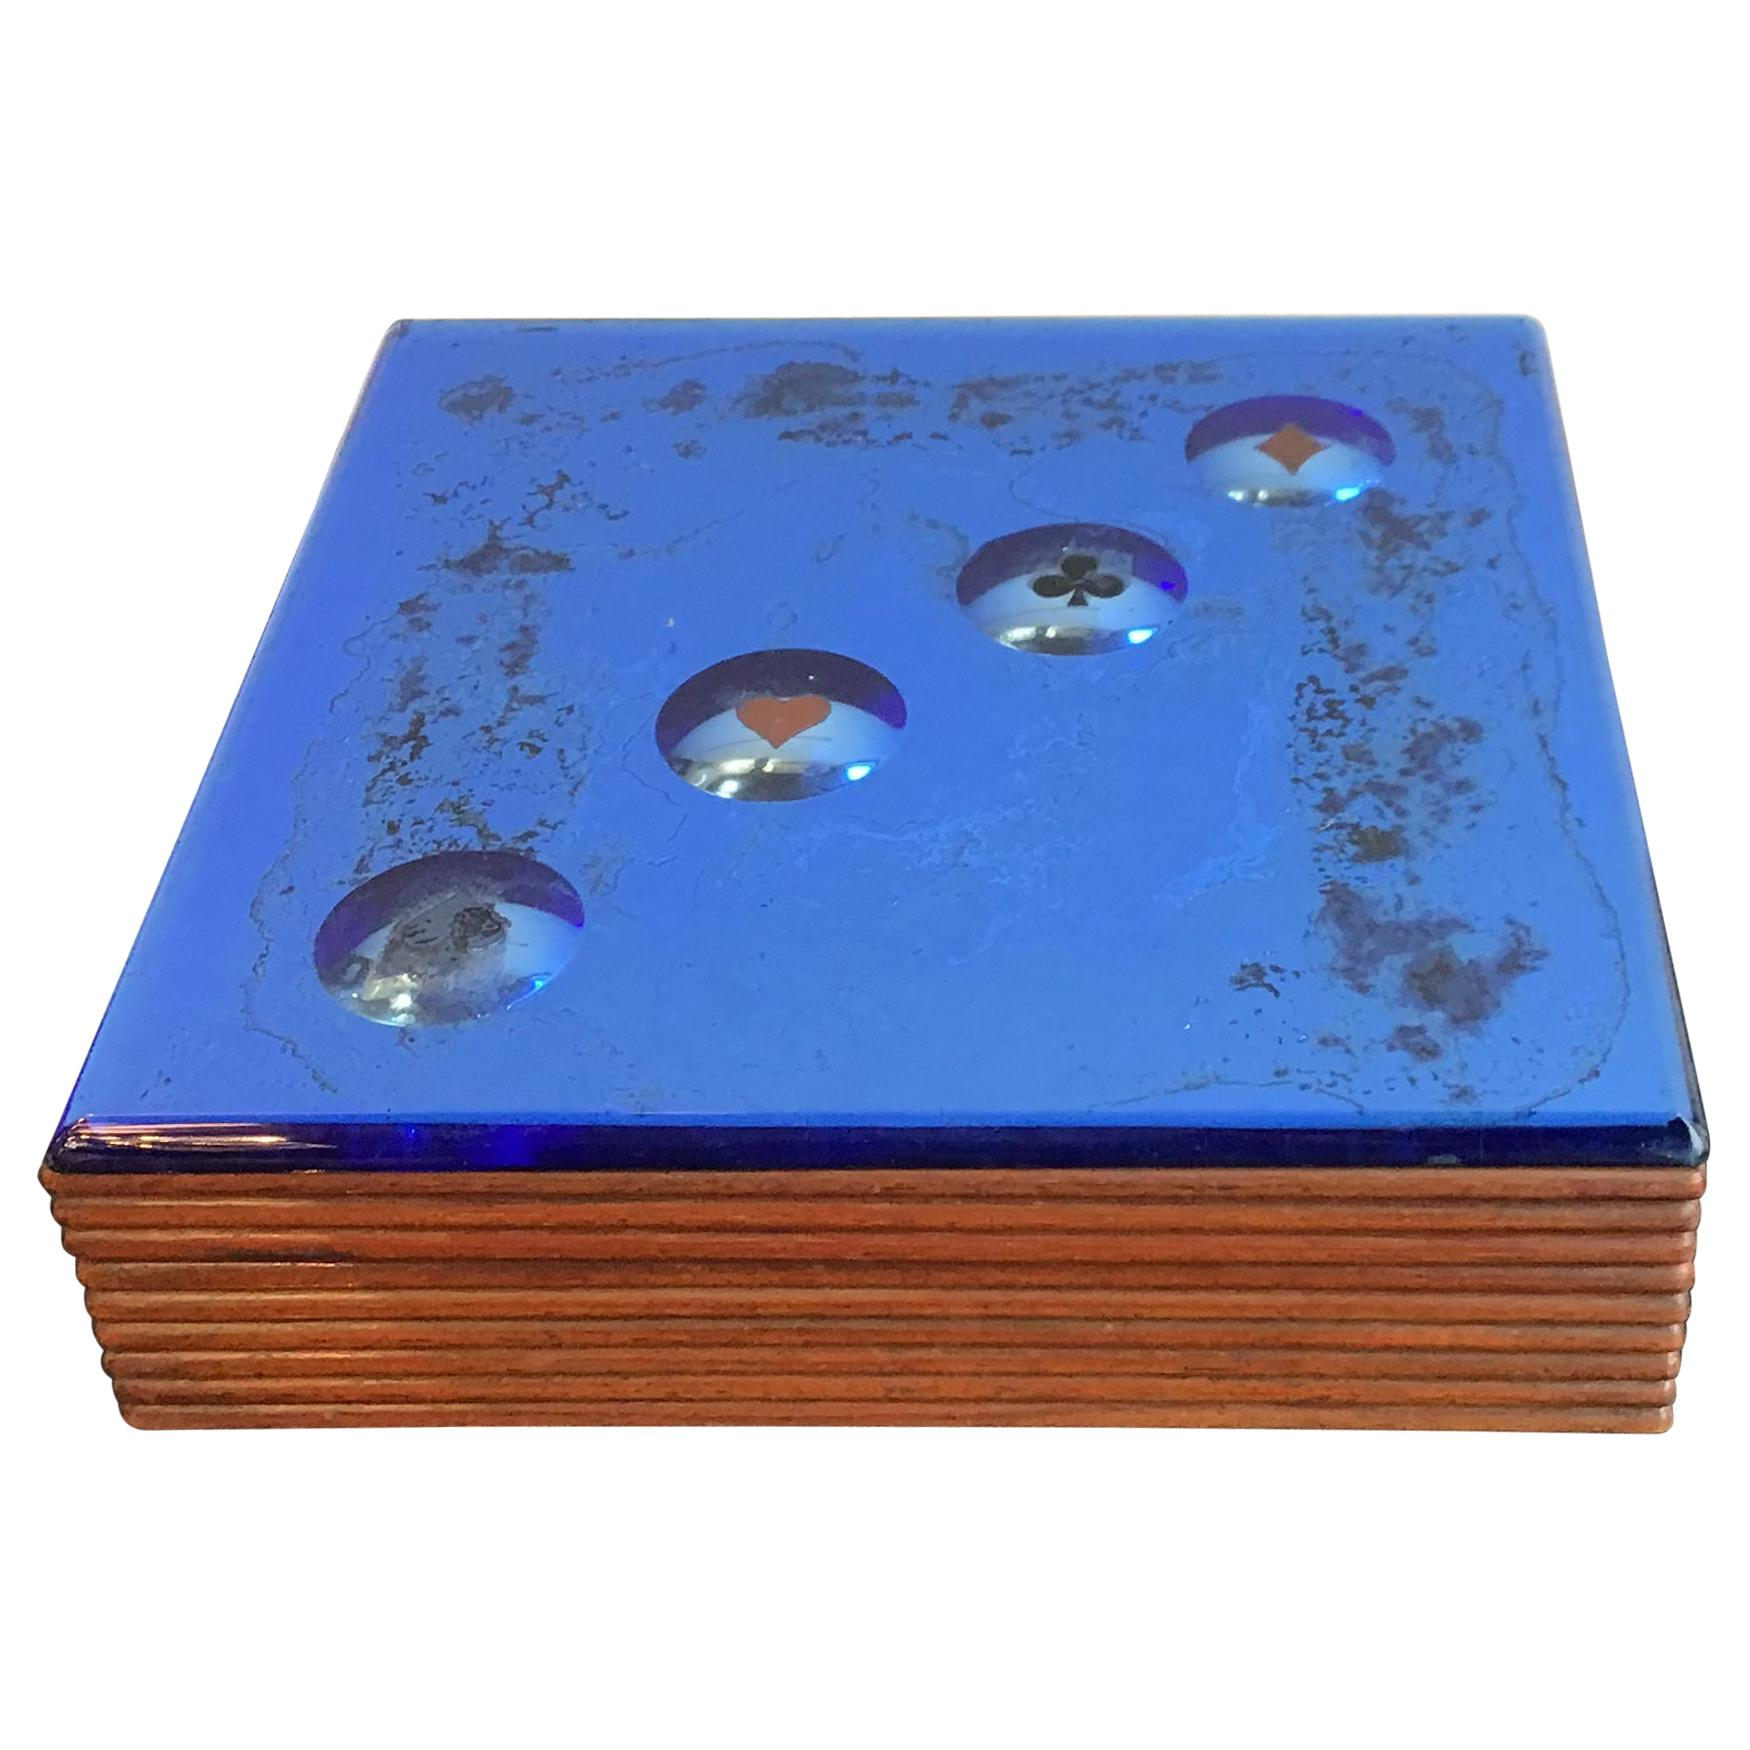 Fontana Arte Blue Mirrored Glass and Wood Game Box, 1950, Italy